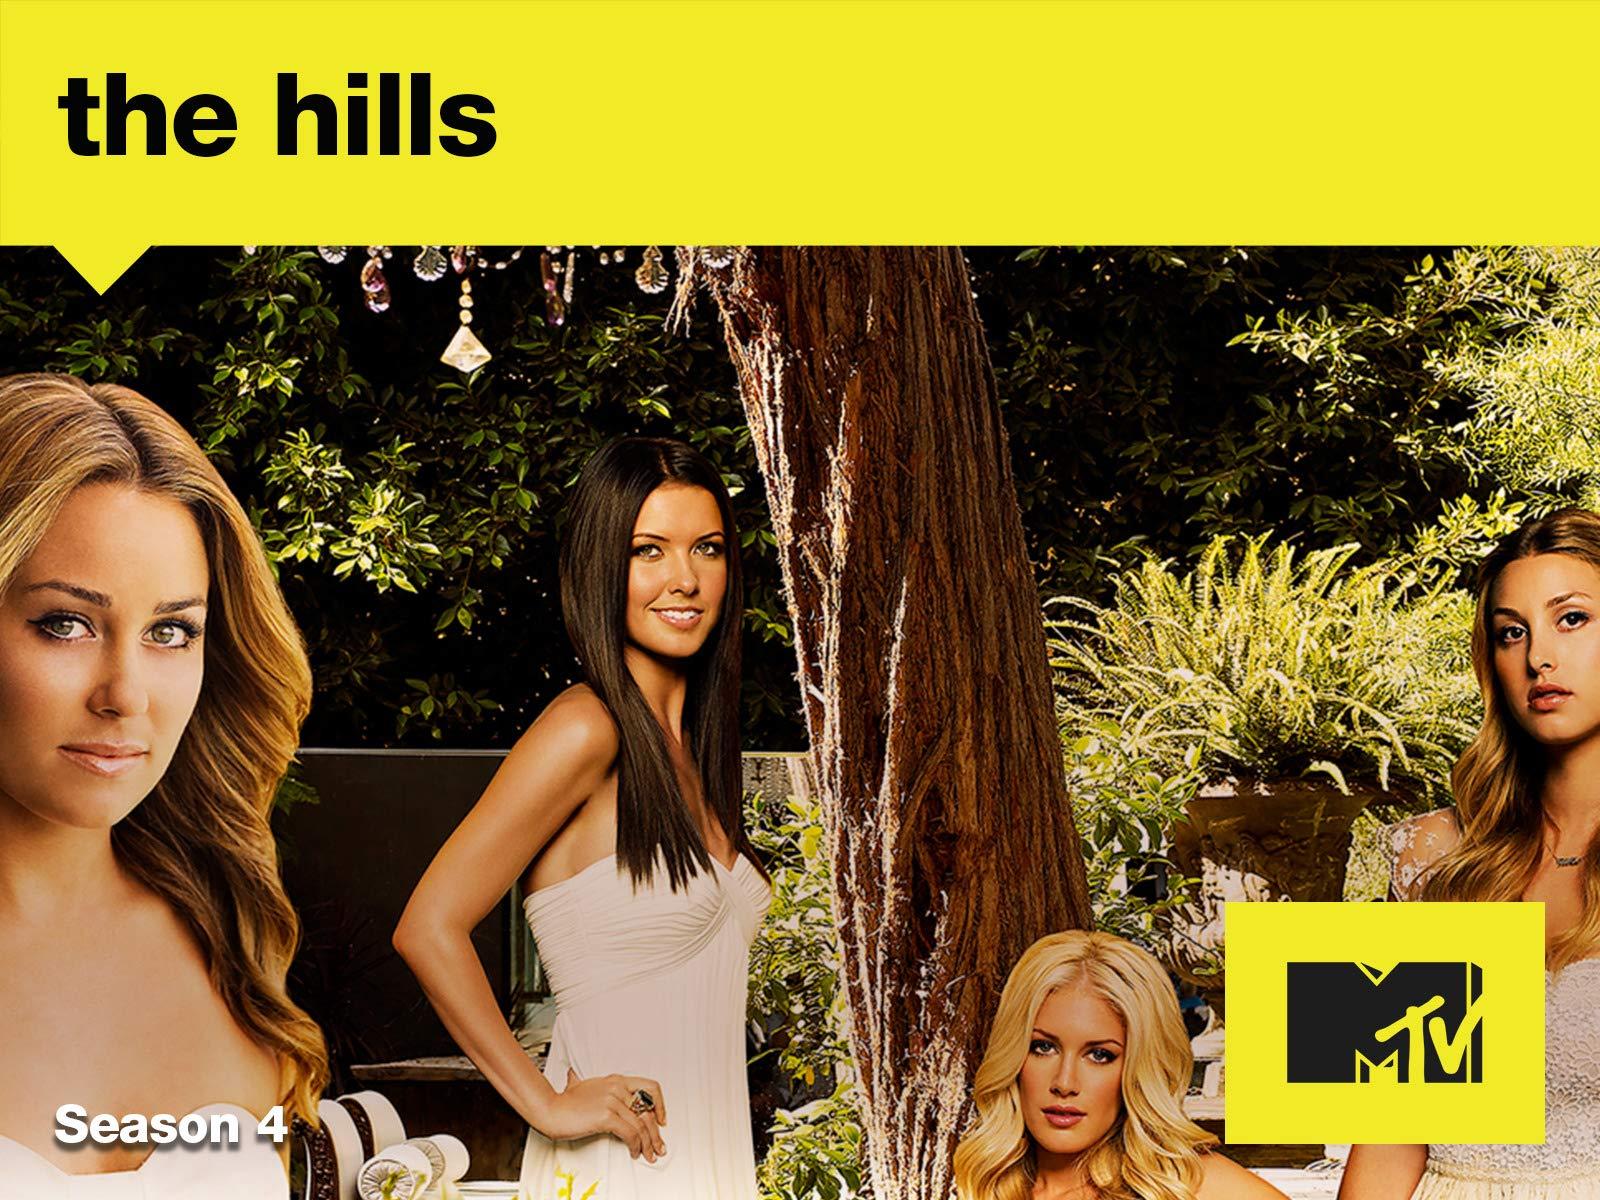 The Hills - Season 4